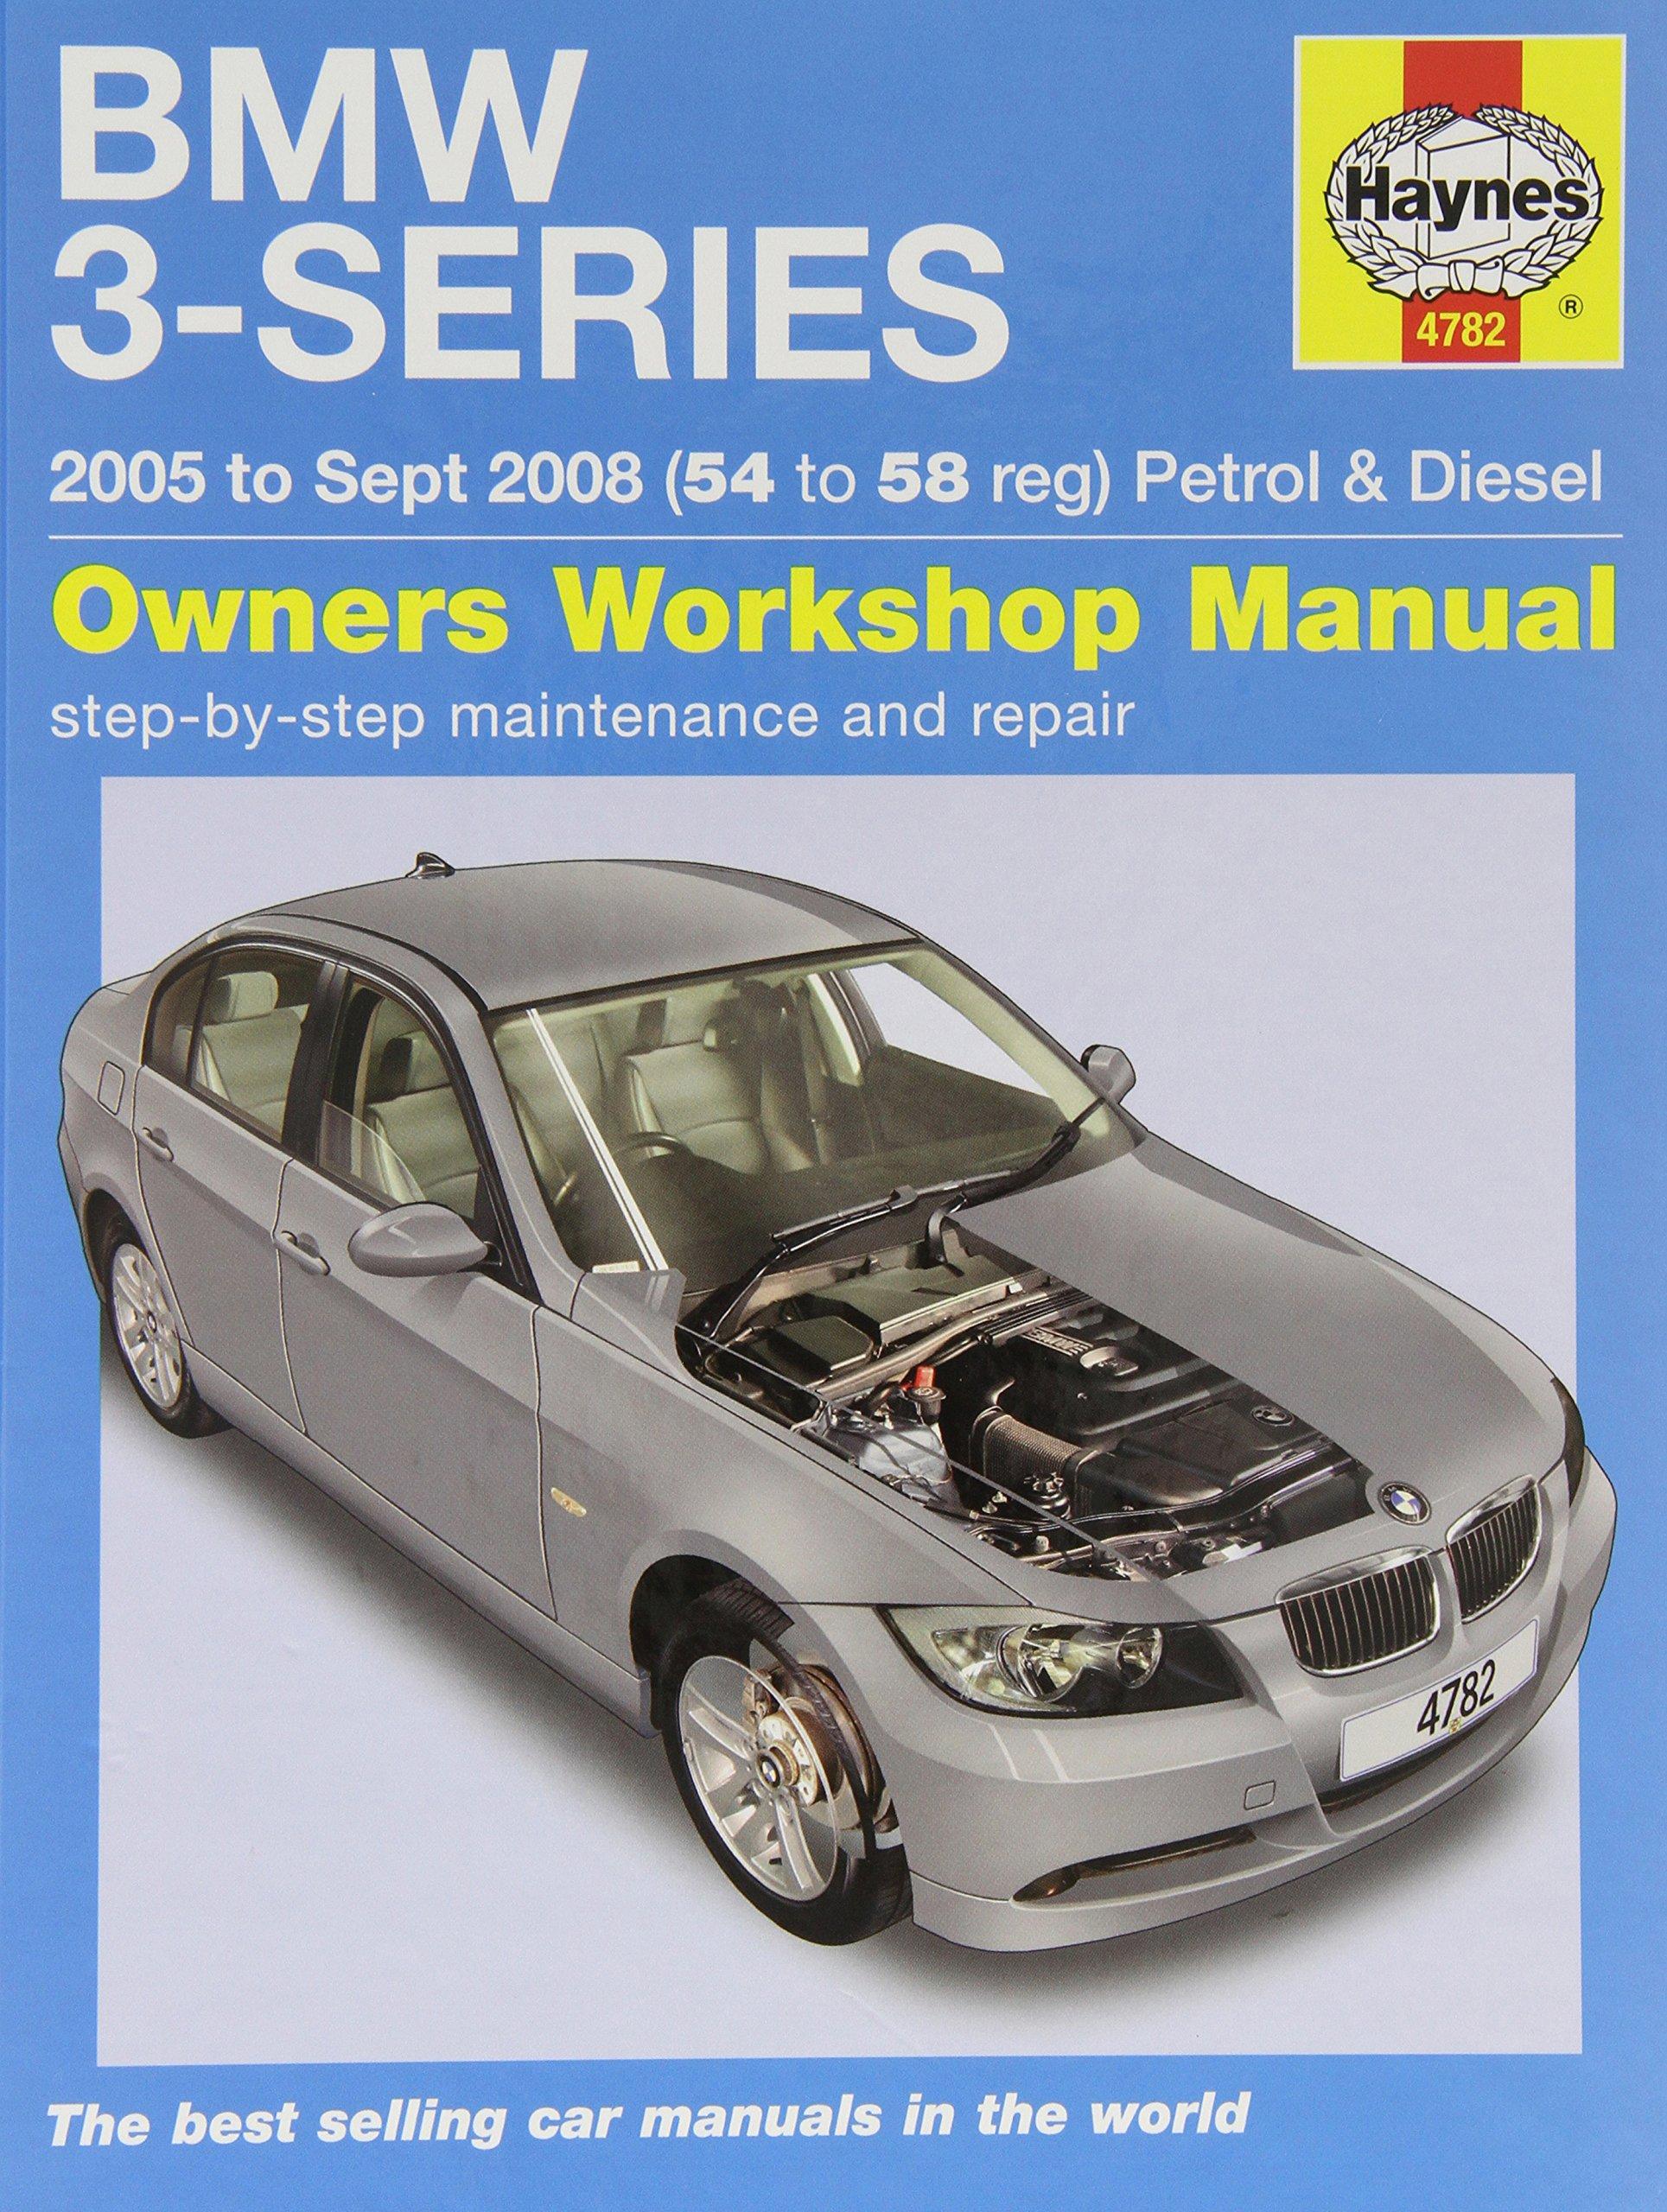 Haynes 4782 Service and Repair Workshop Manual Automotive – 7 Nov 2014